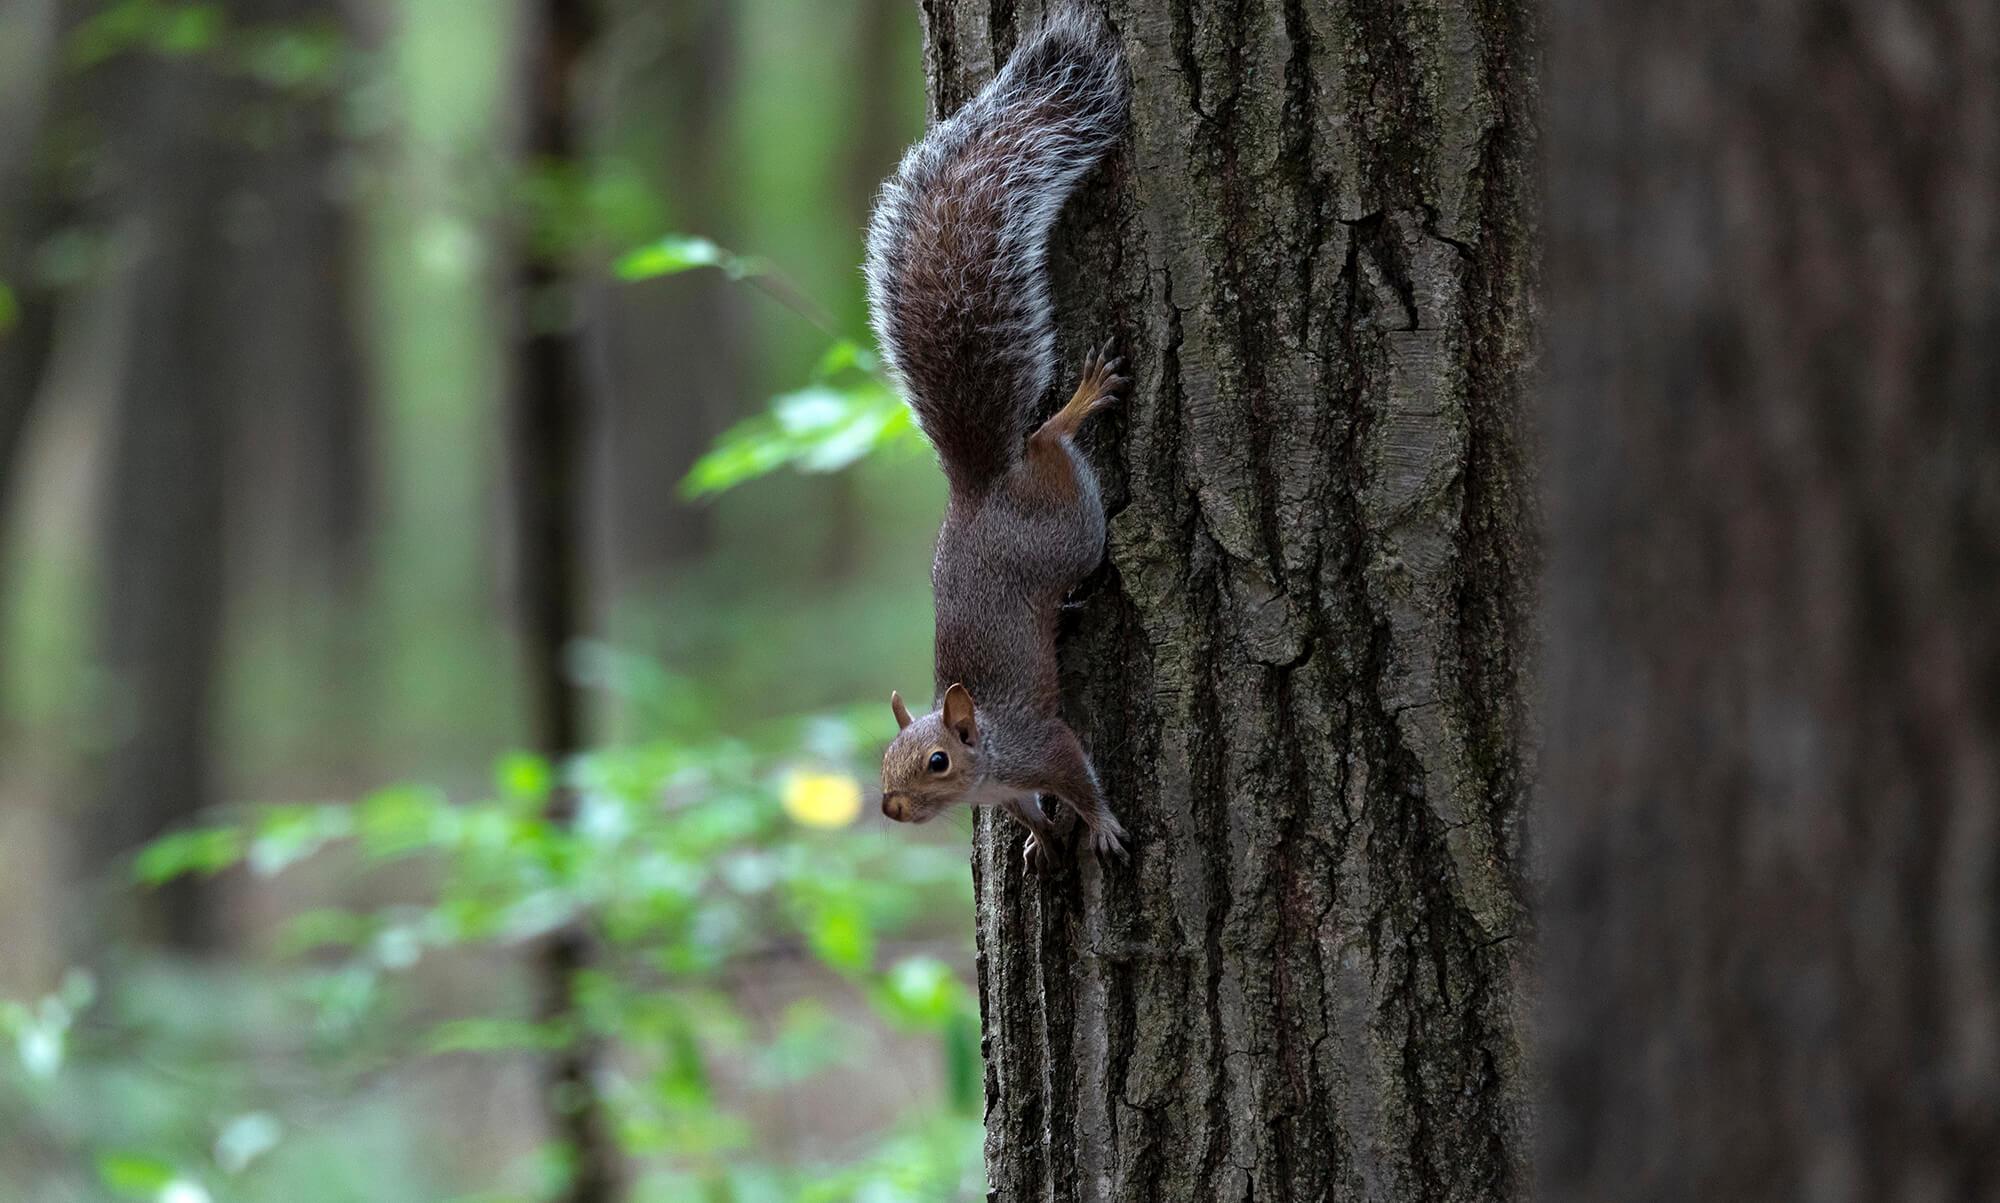 Squirrel vertically facing down